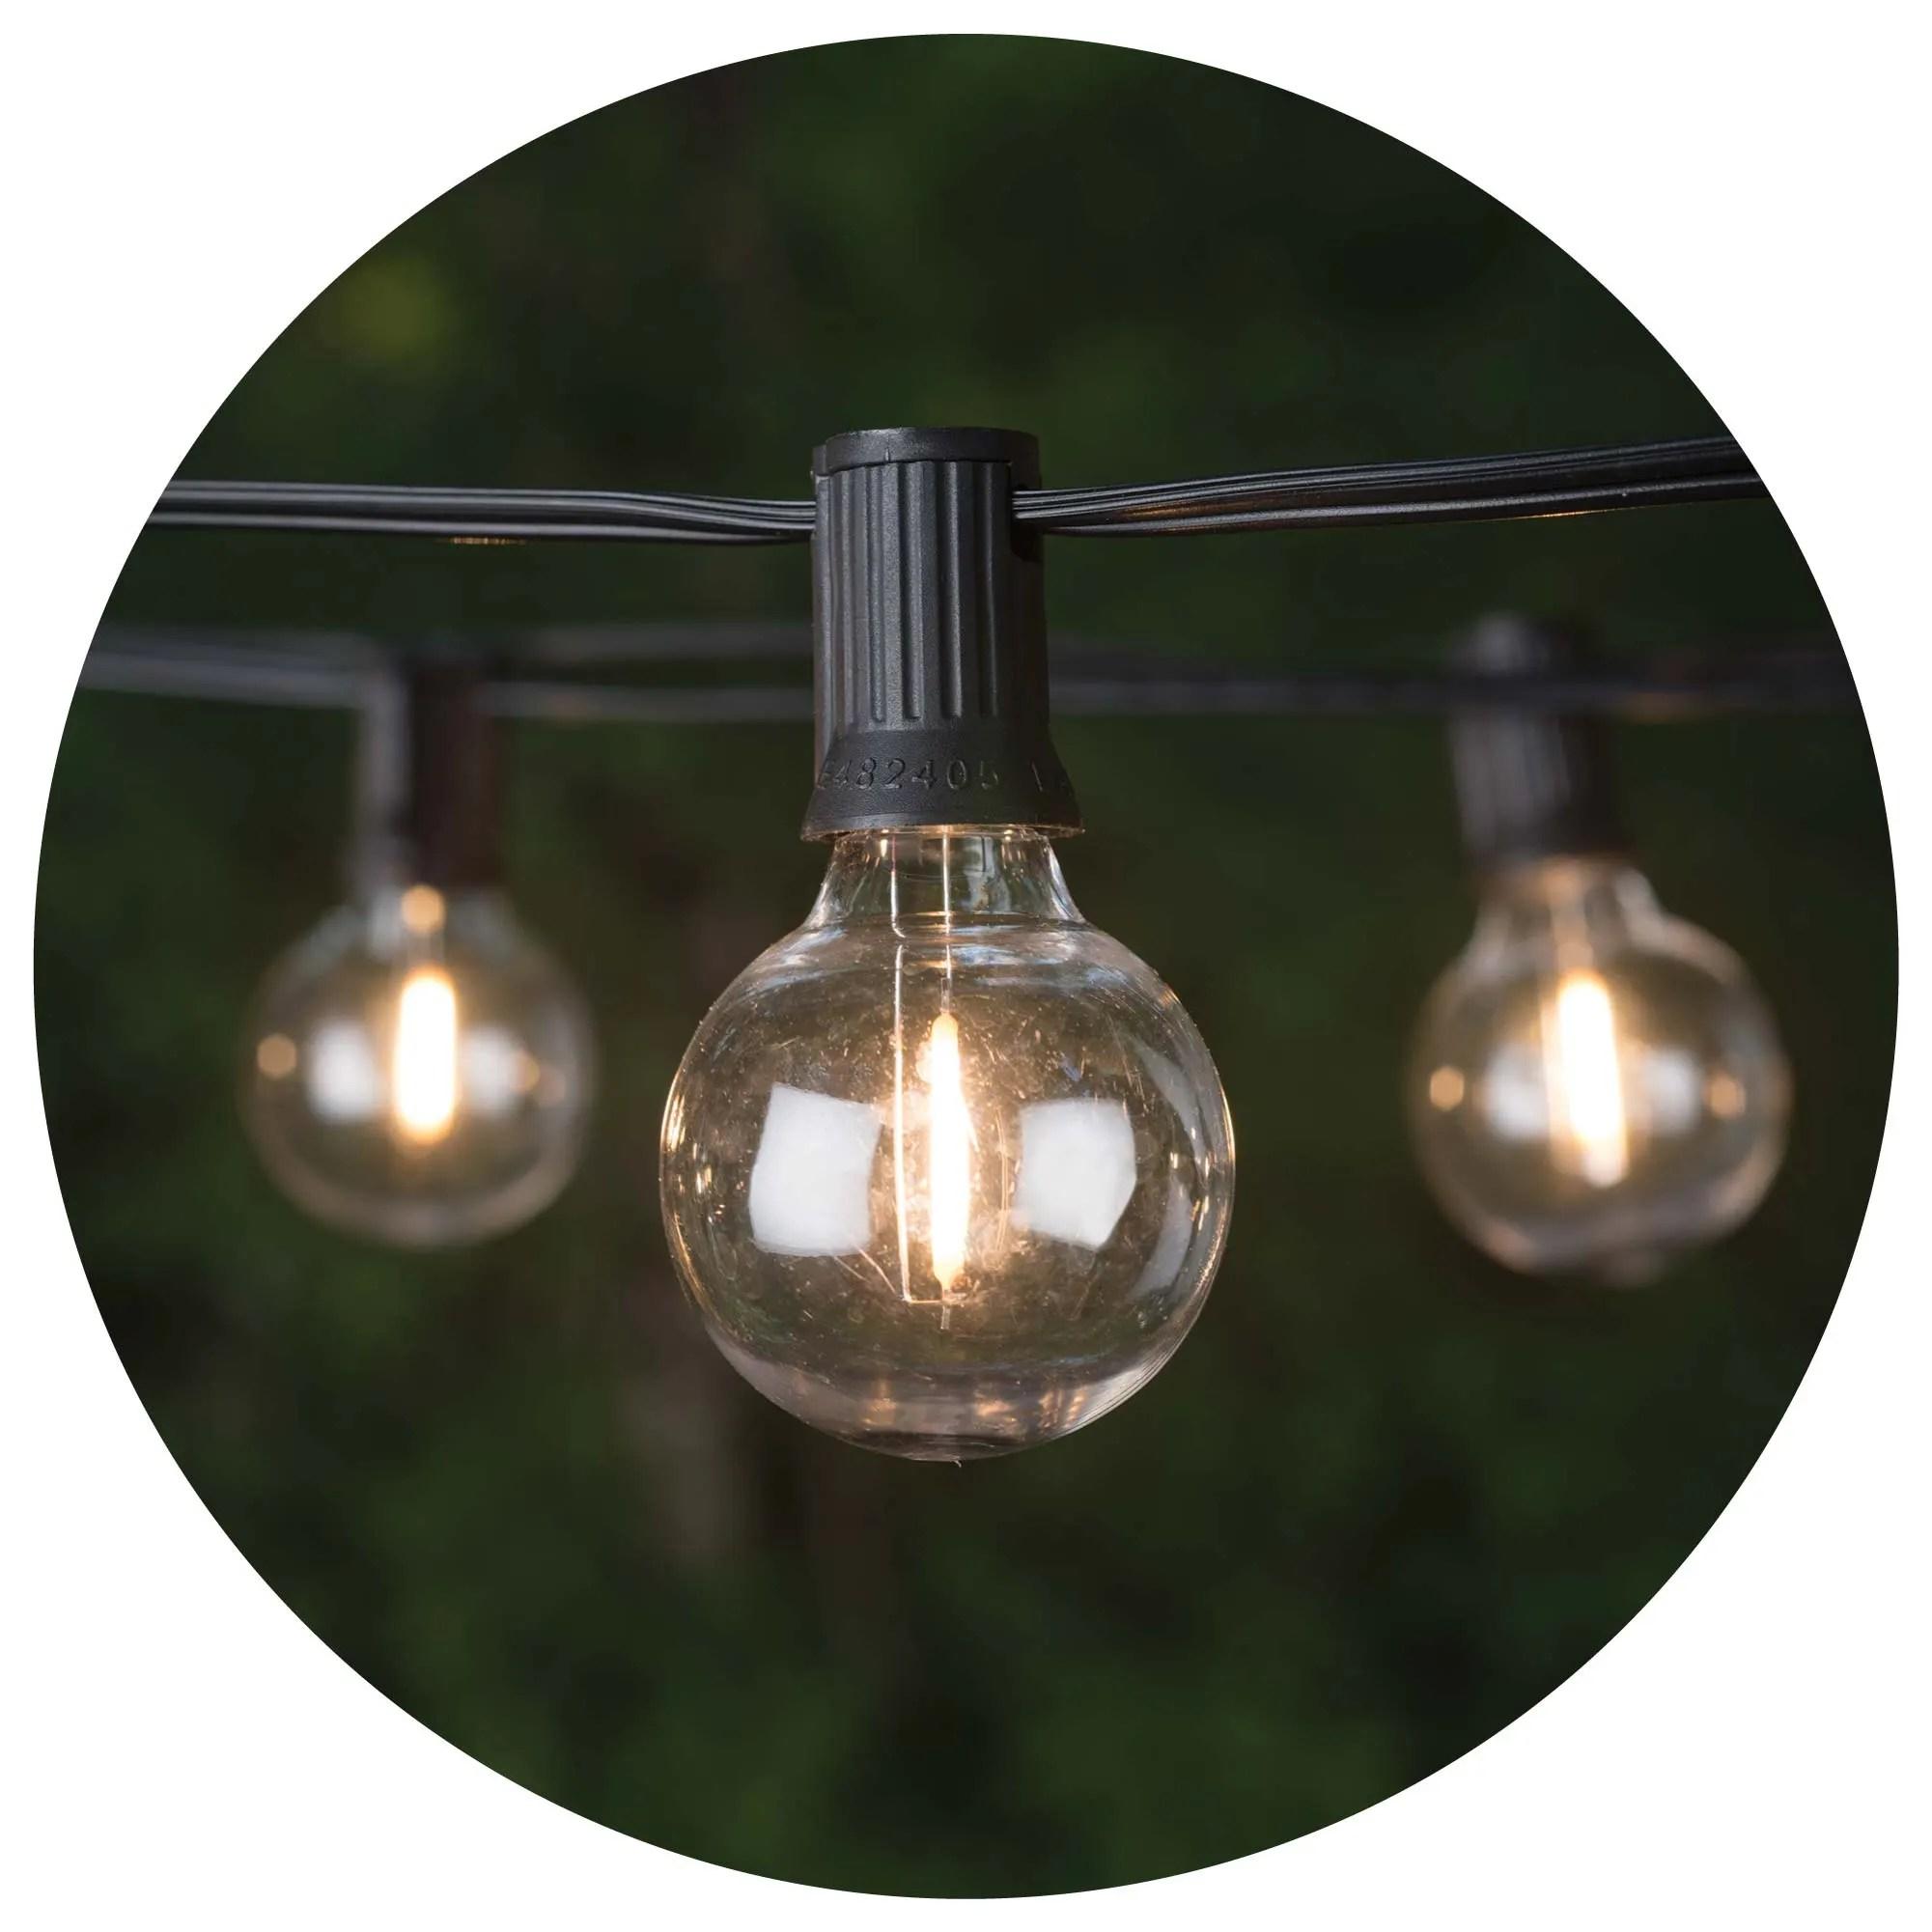 Safety Security Lighting Indoor Outdoor Mr Beams